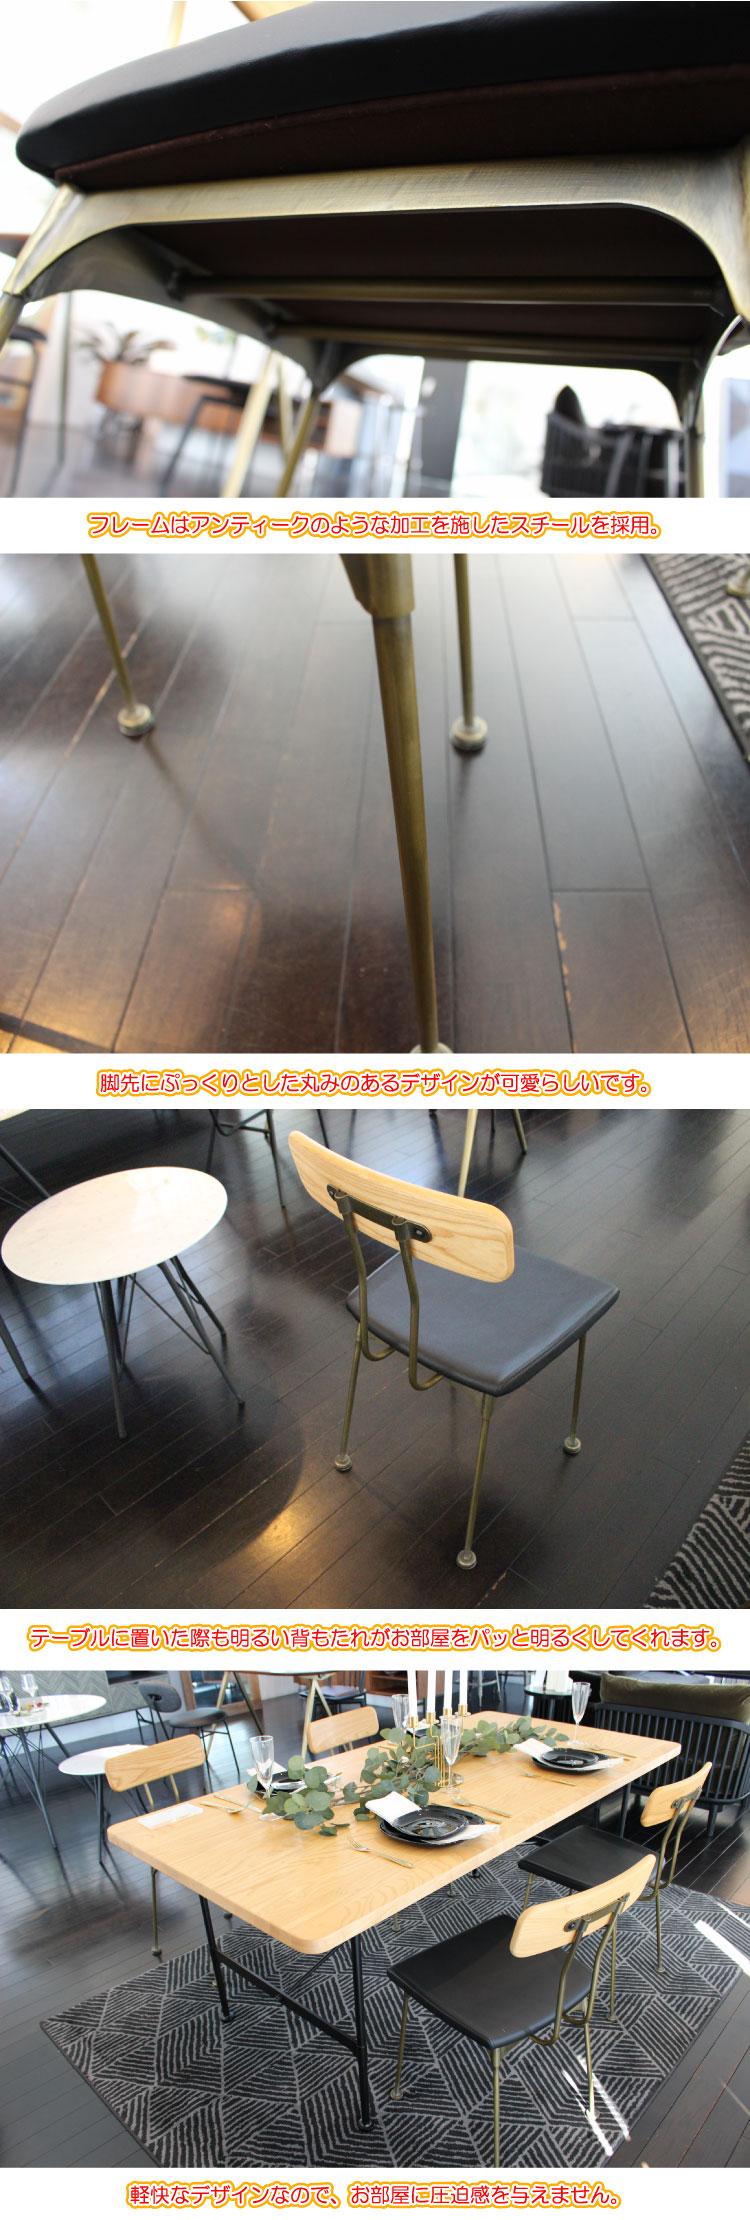 PUレザー&天然木アッシュ製・ダイニングチェア(2脚セット)完成品